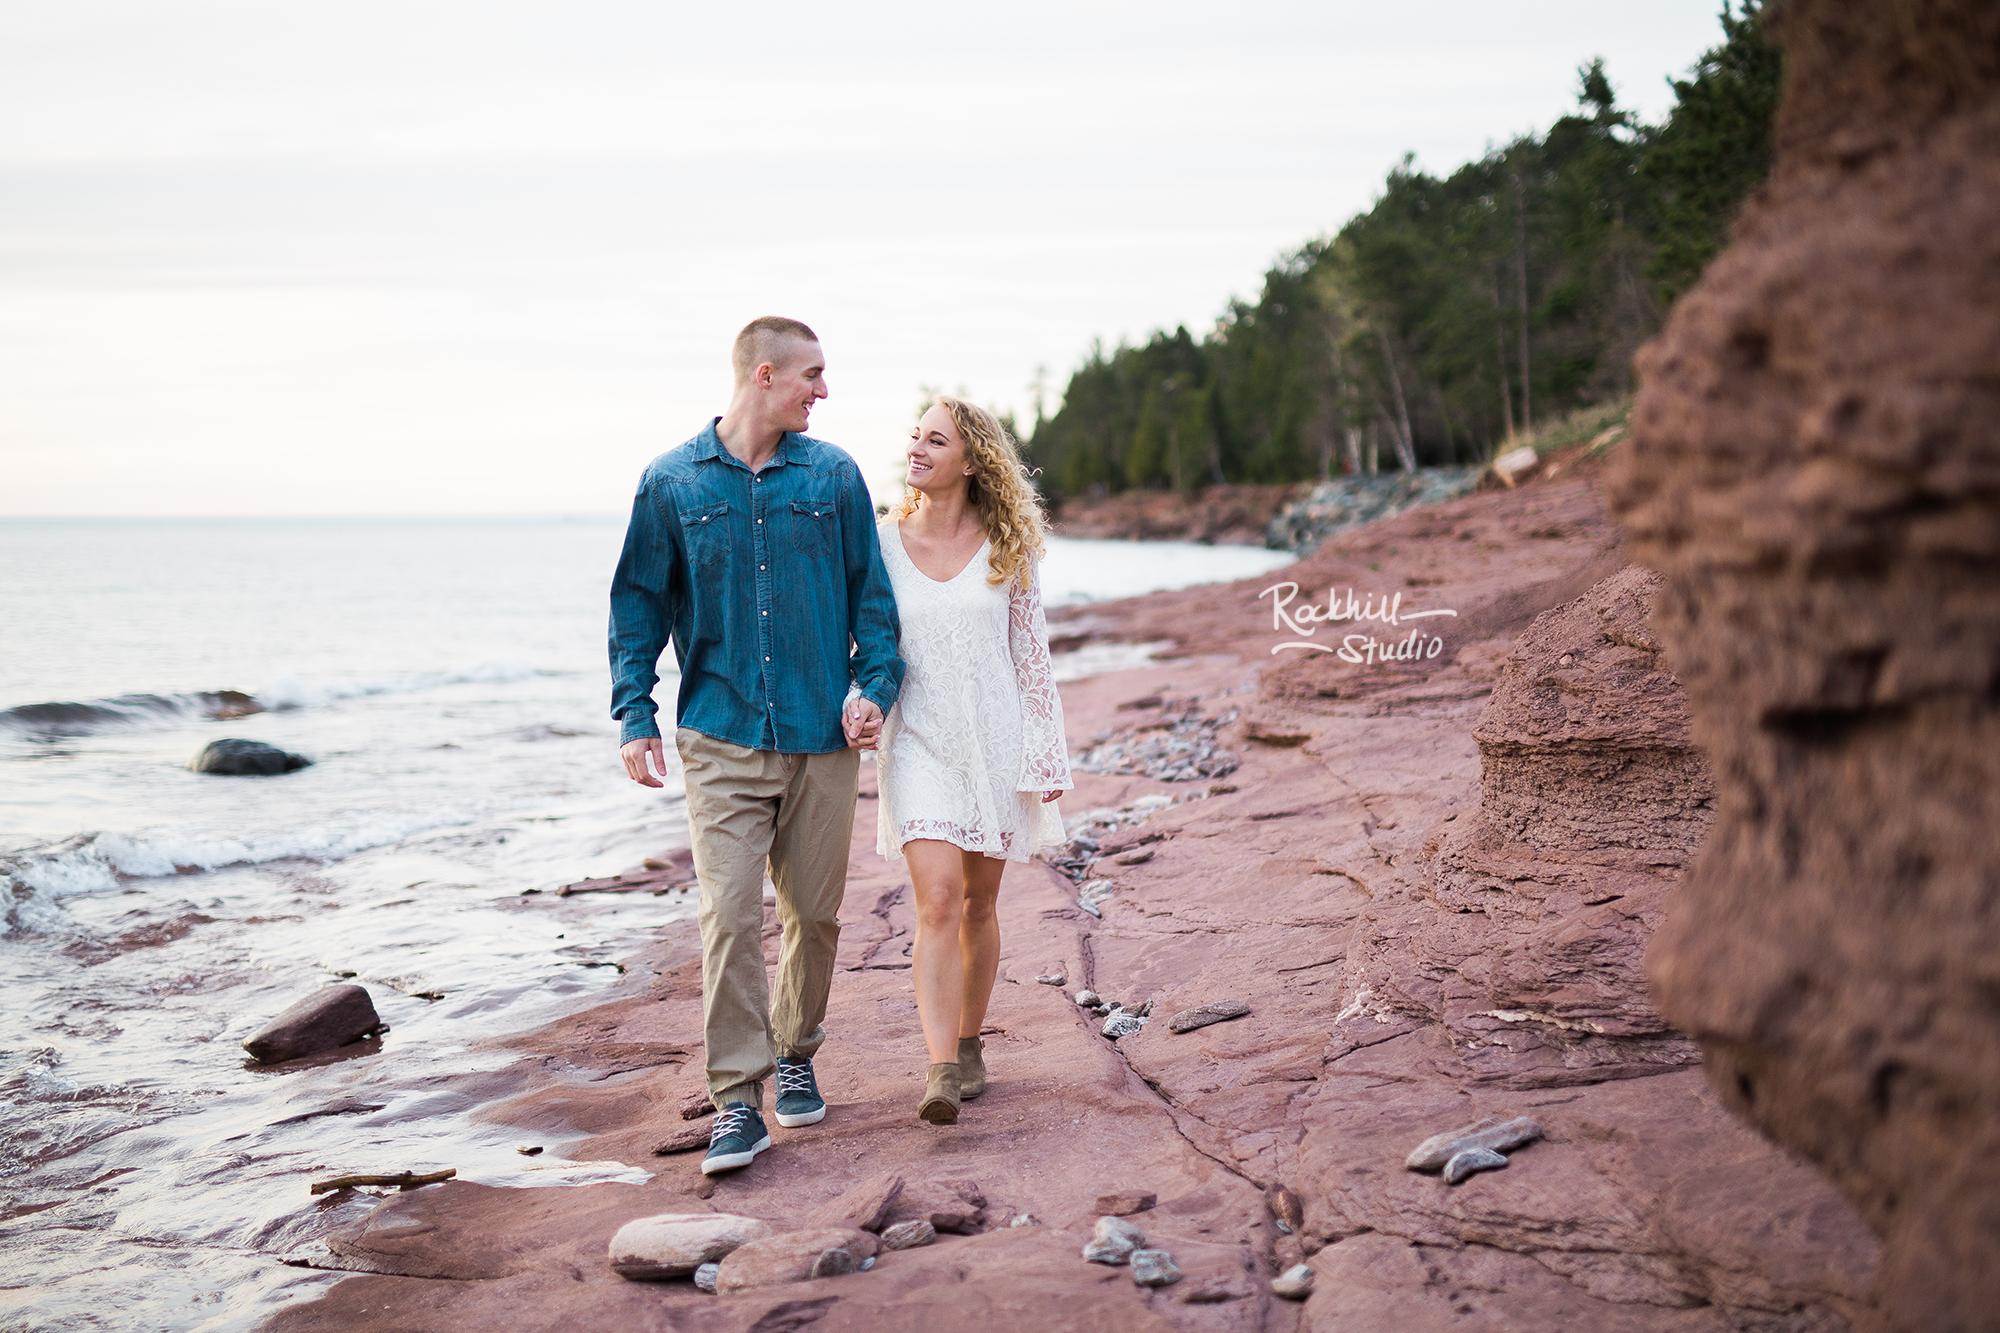 marquette-michigan-wedding-photography-rockhill-presque-isle-upper-peninsula-michigan-haley-47.jpg